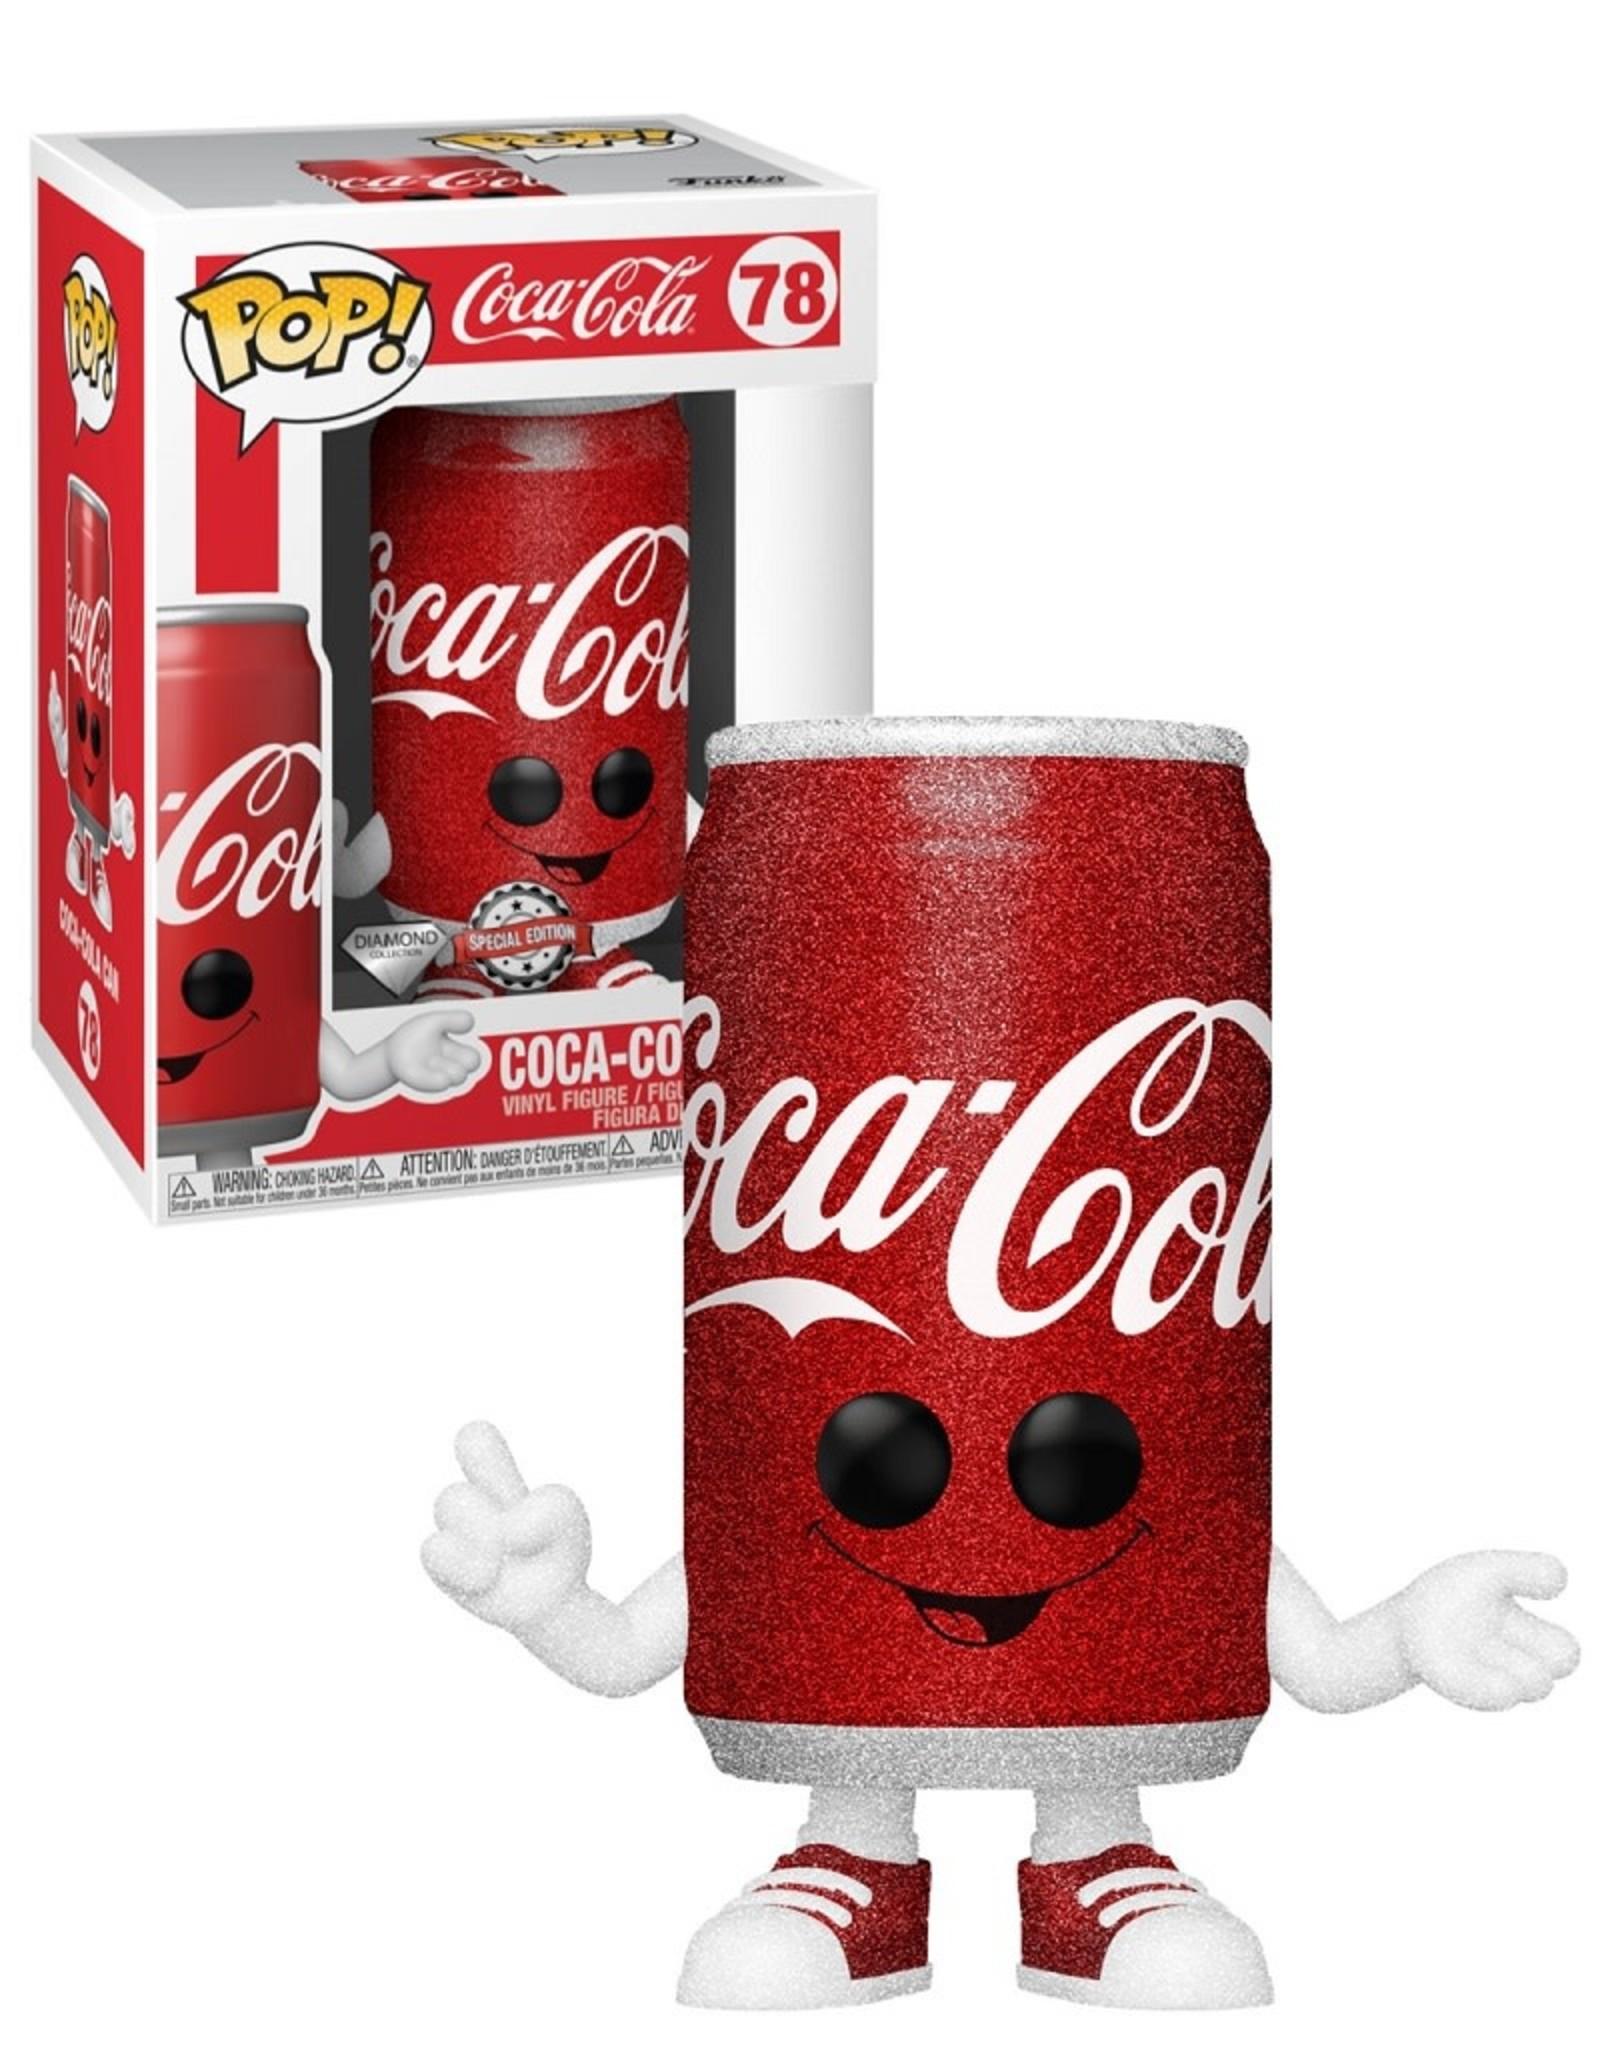 Coca-Cola 78 ( Funko Pop ) Coca-Cola Can